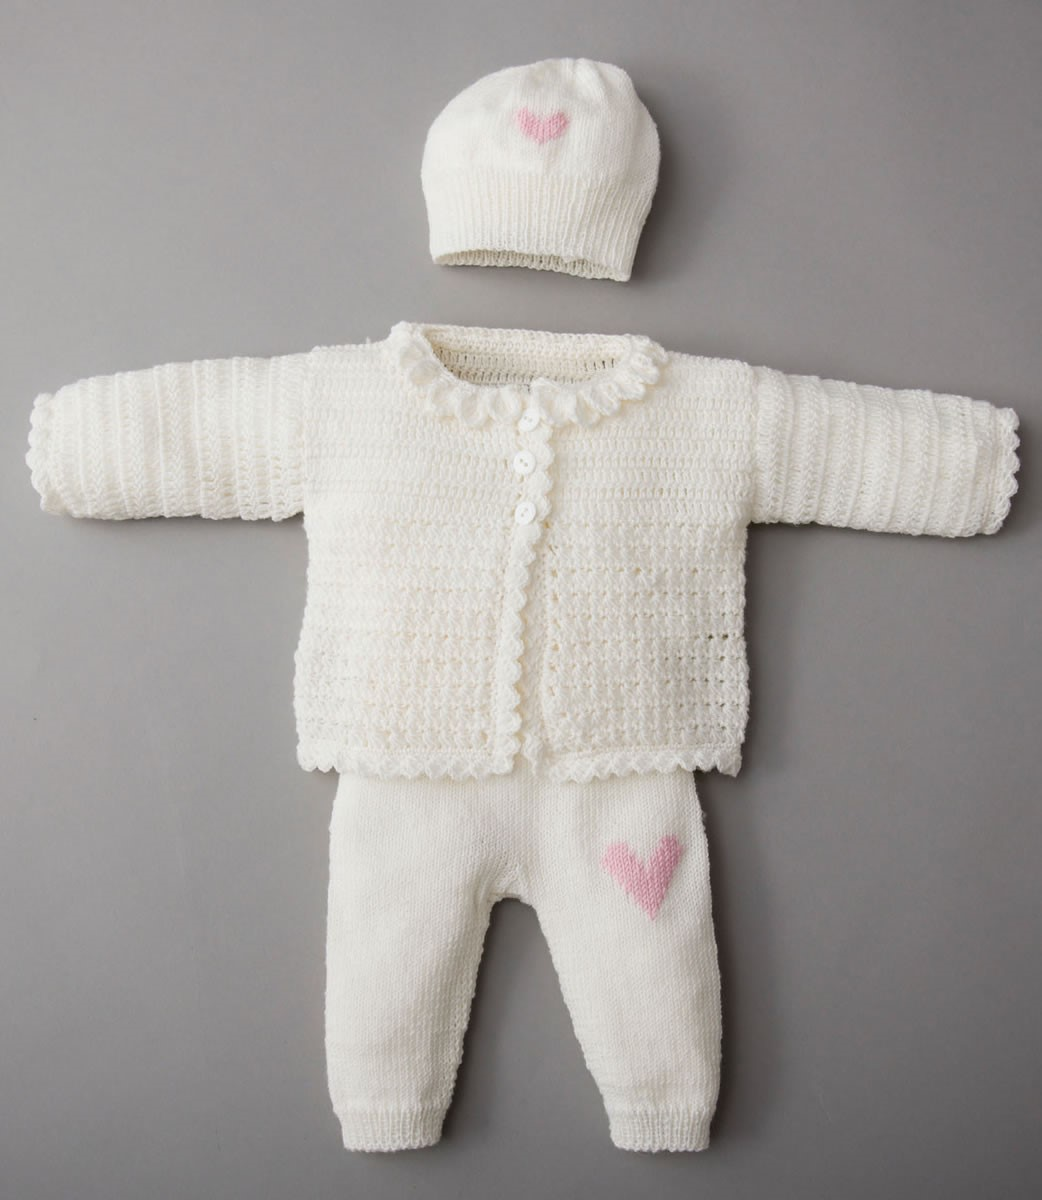 Lana Grossa CARDIGAN, PANTALON, BONNET ET CHAUSSONS Cool Wool Baby